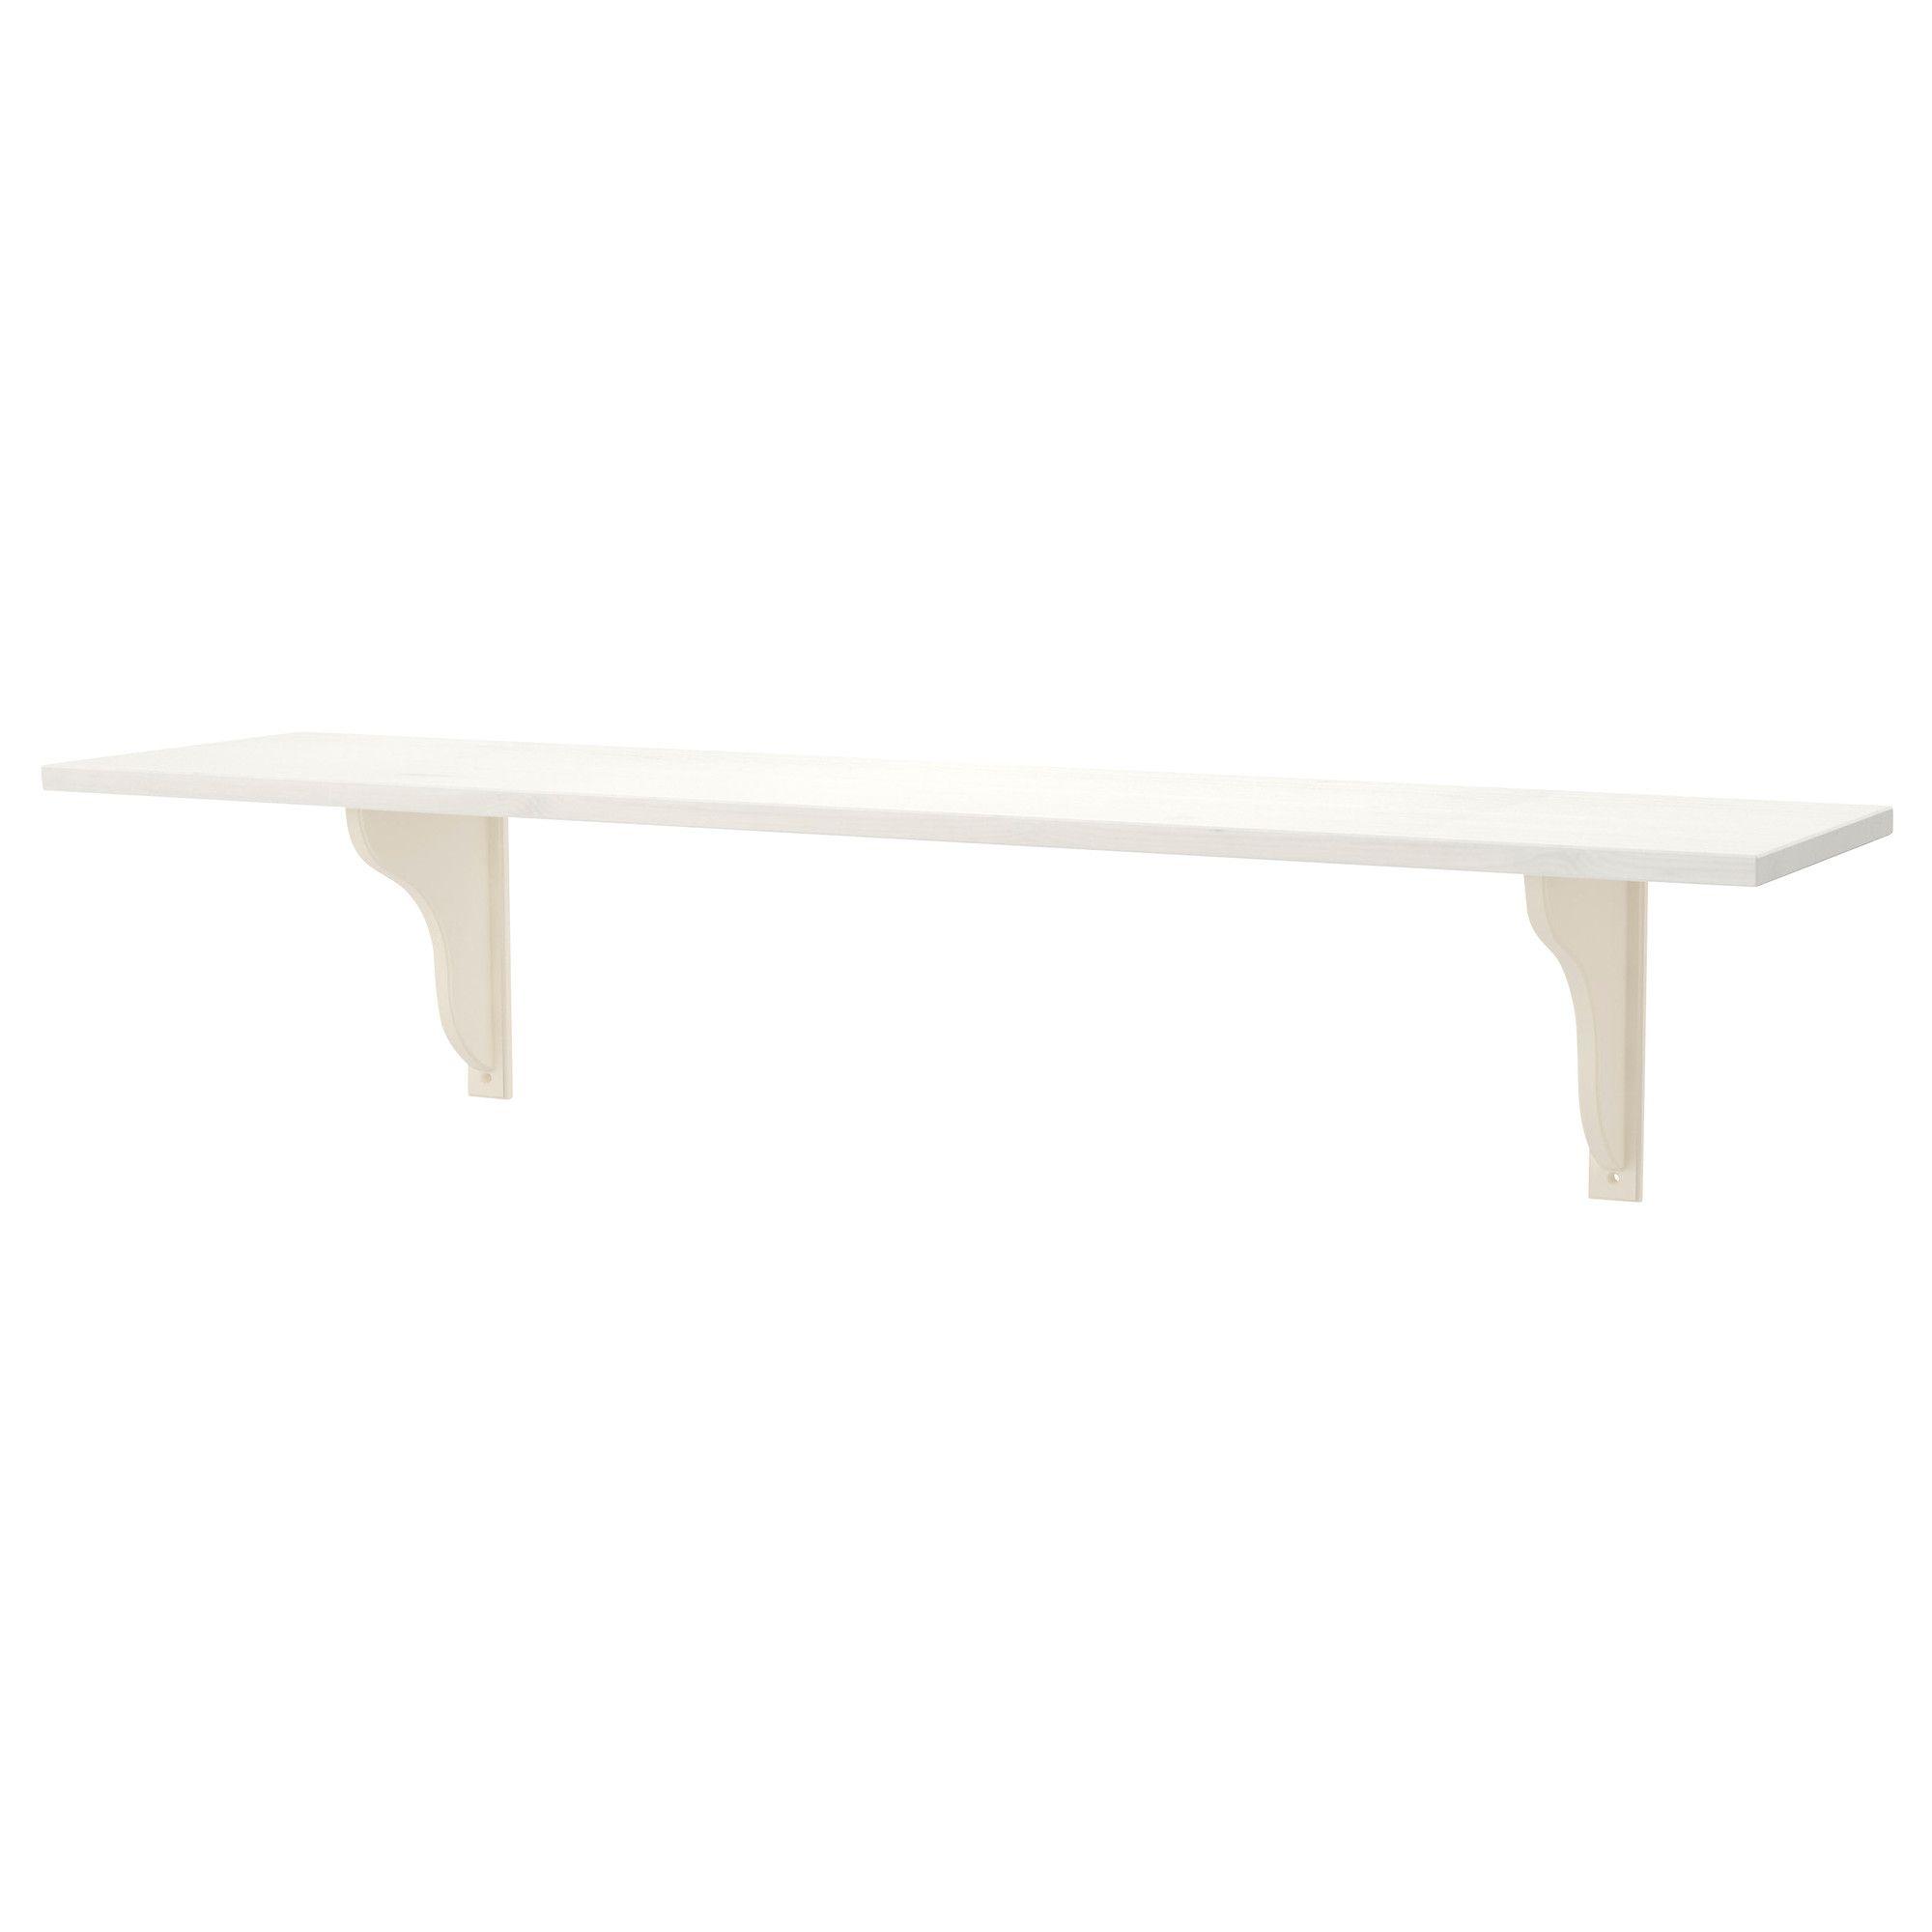 Ikea De Catalog Products S19926717